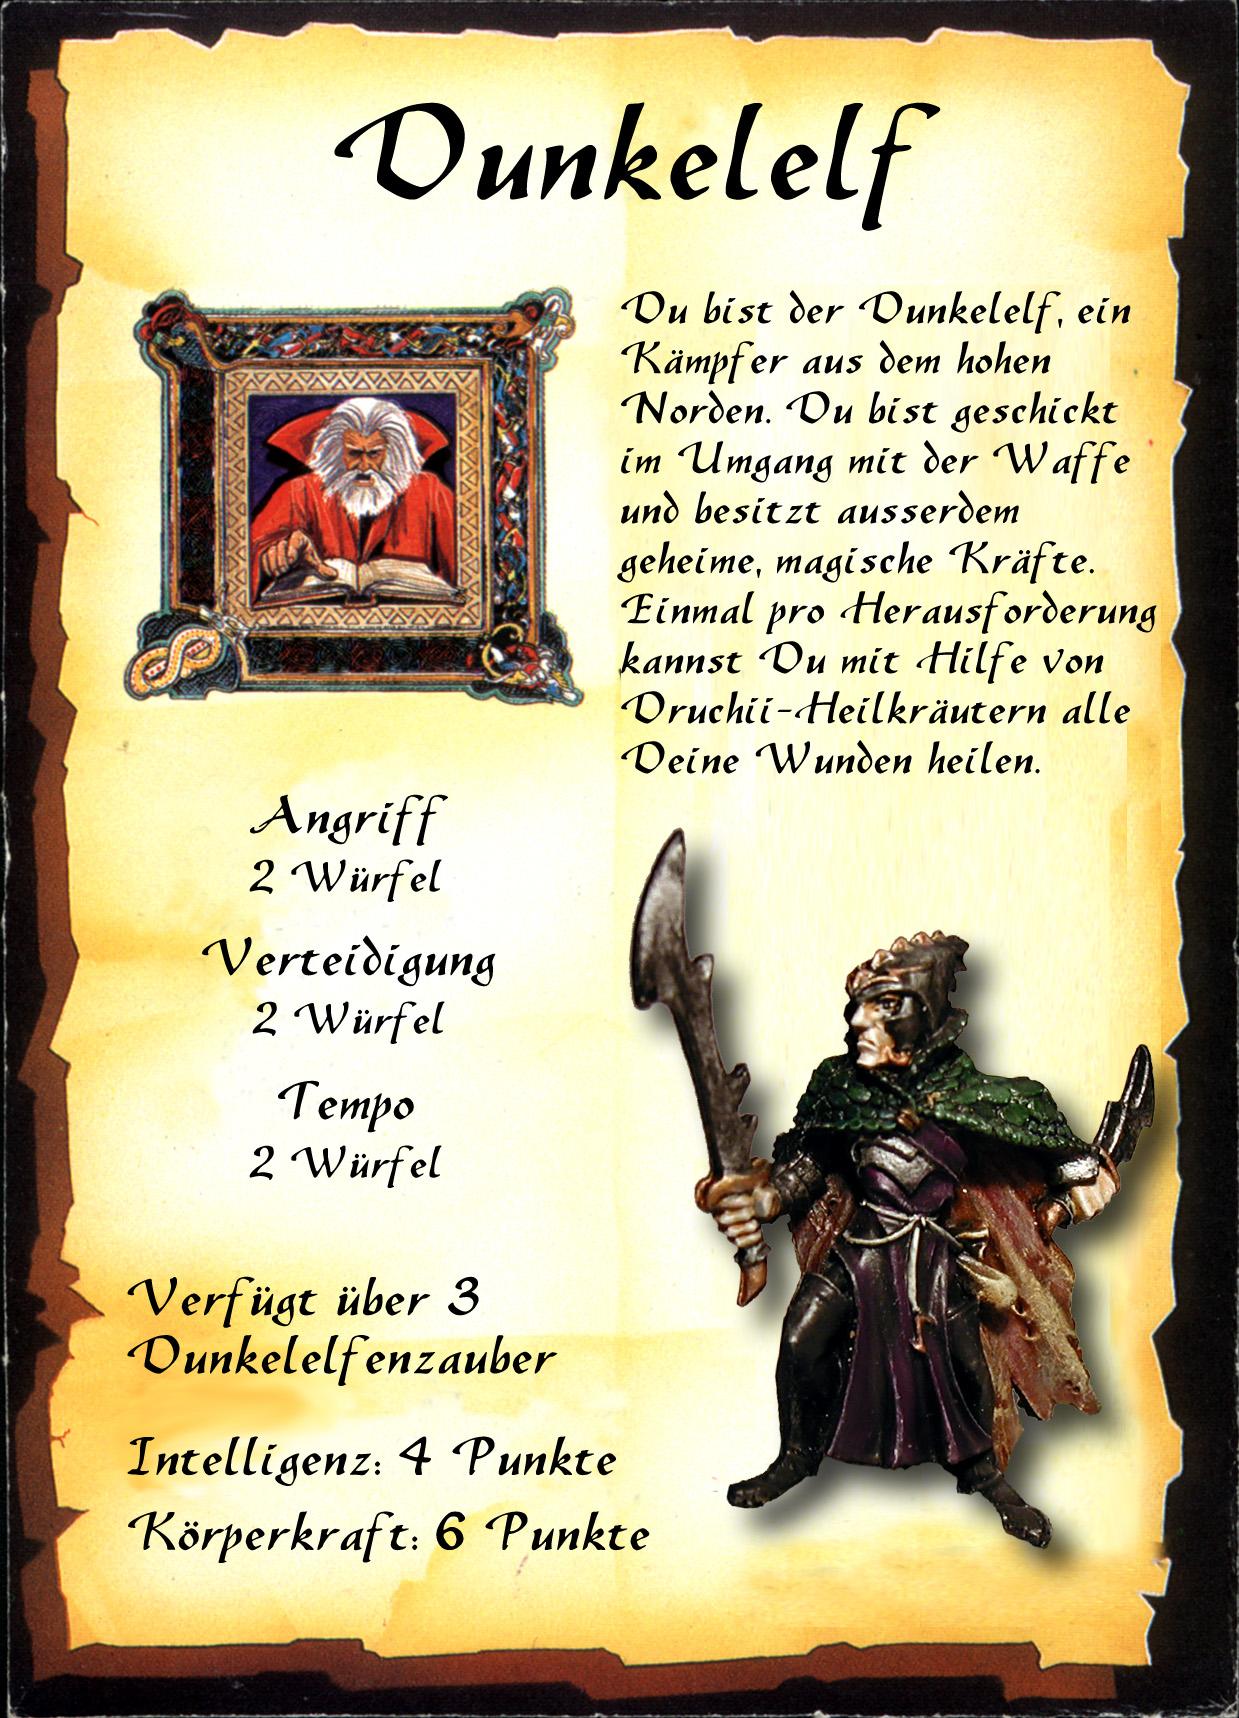 http://www.hq-cooperation.de/content/zubehoer/charaktere/dunkelelf/dunkelelf_char.jpg